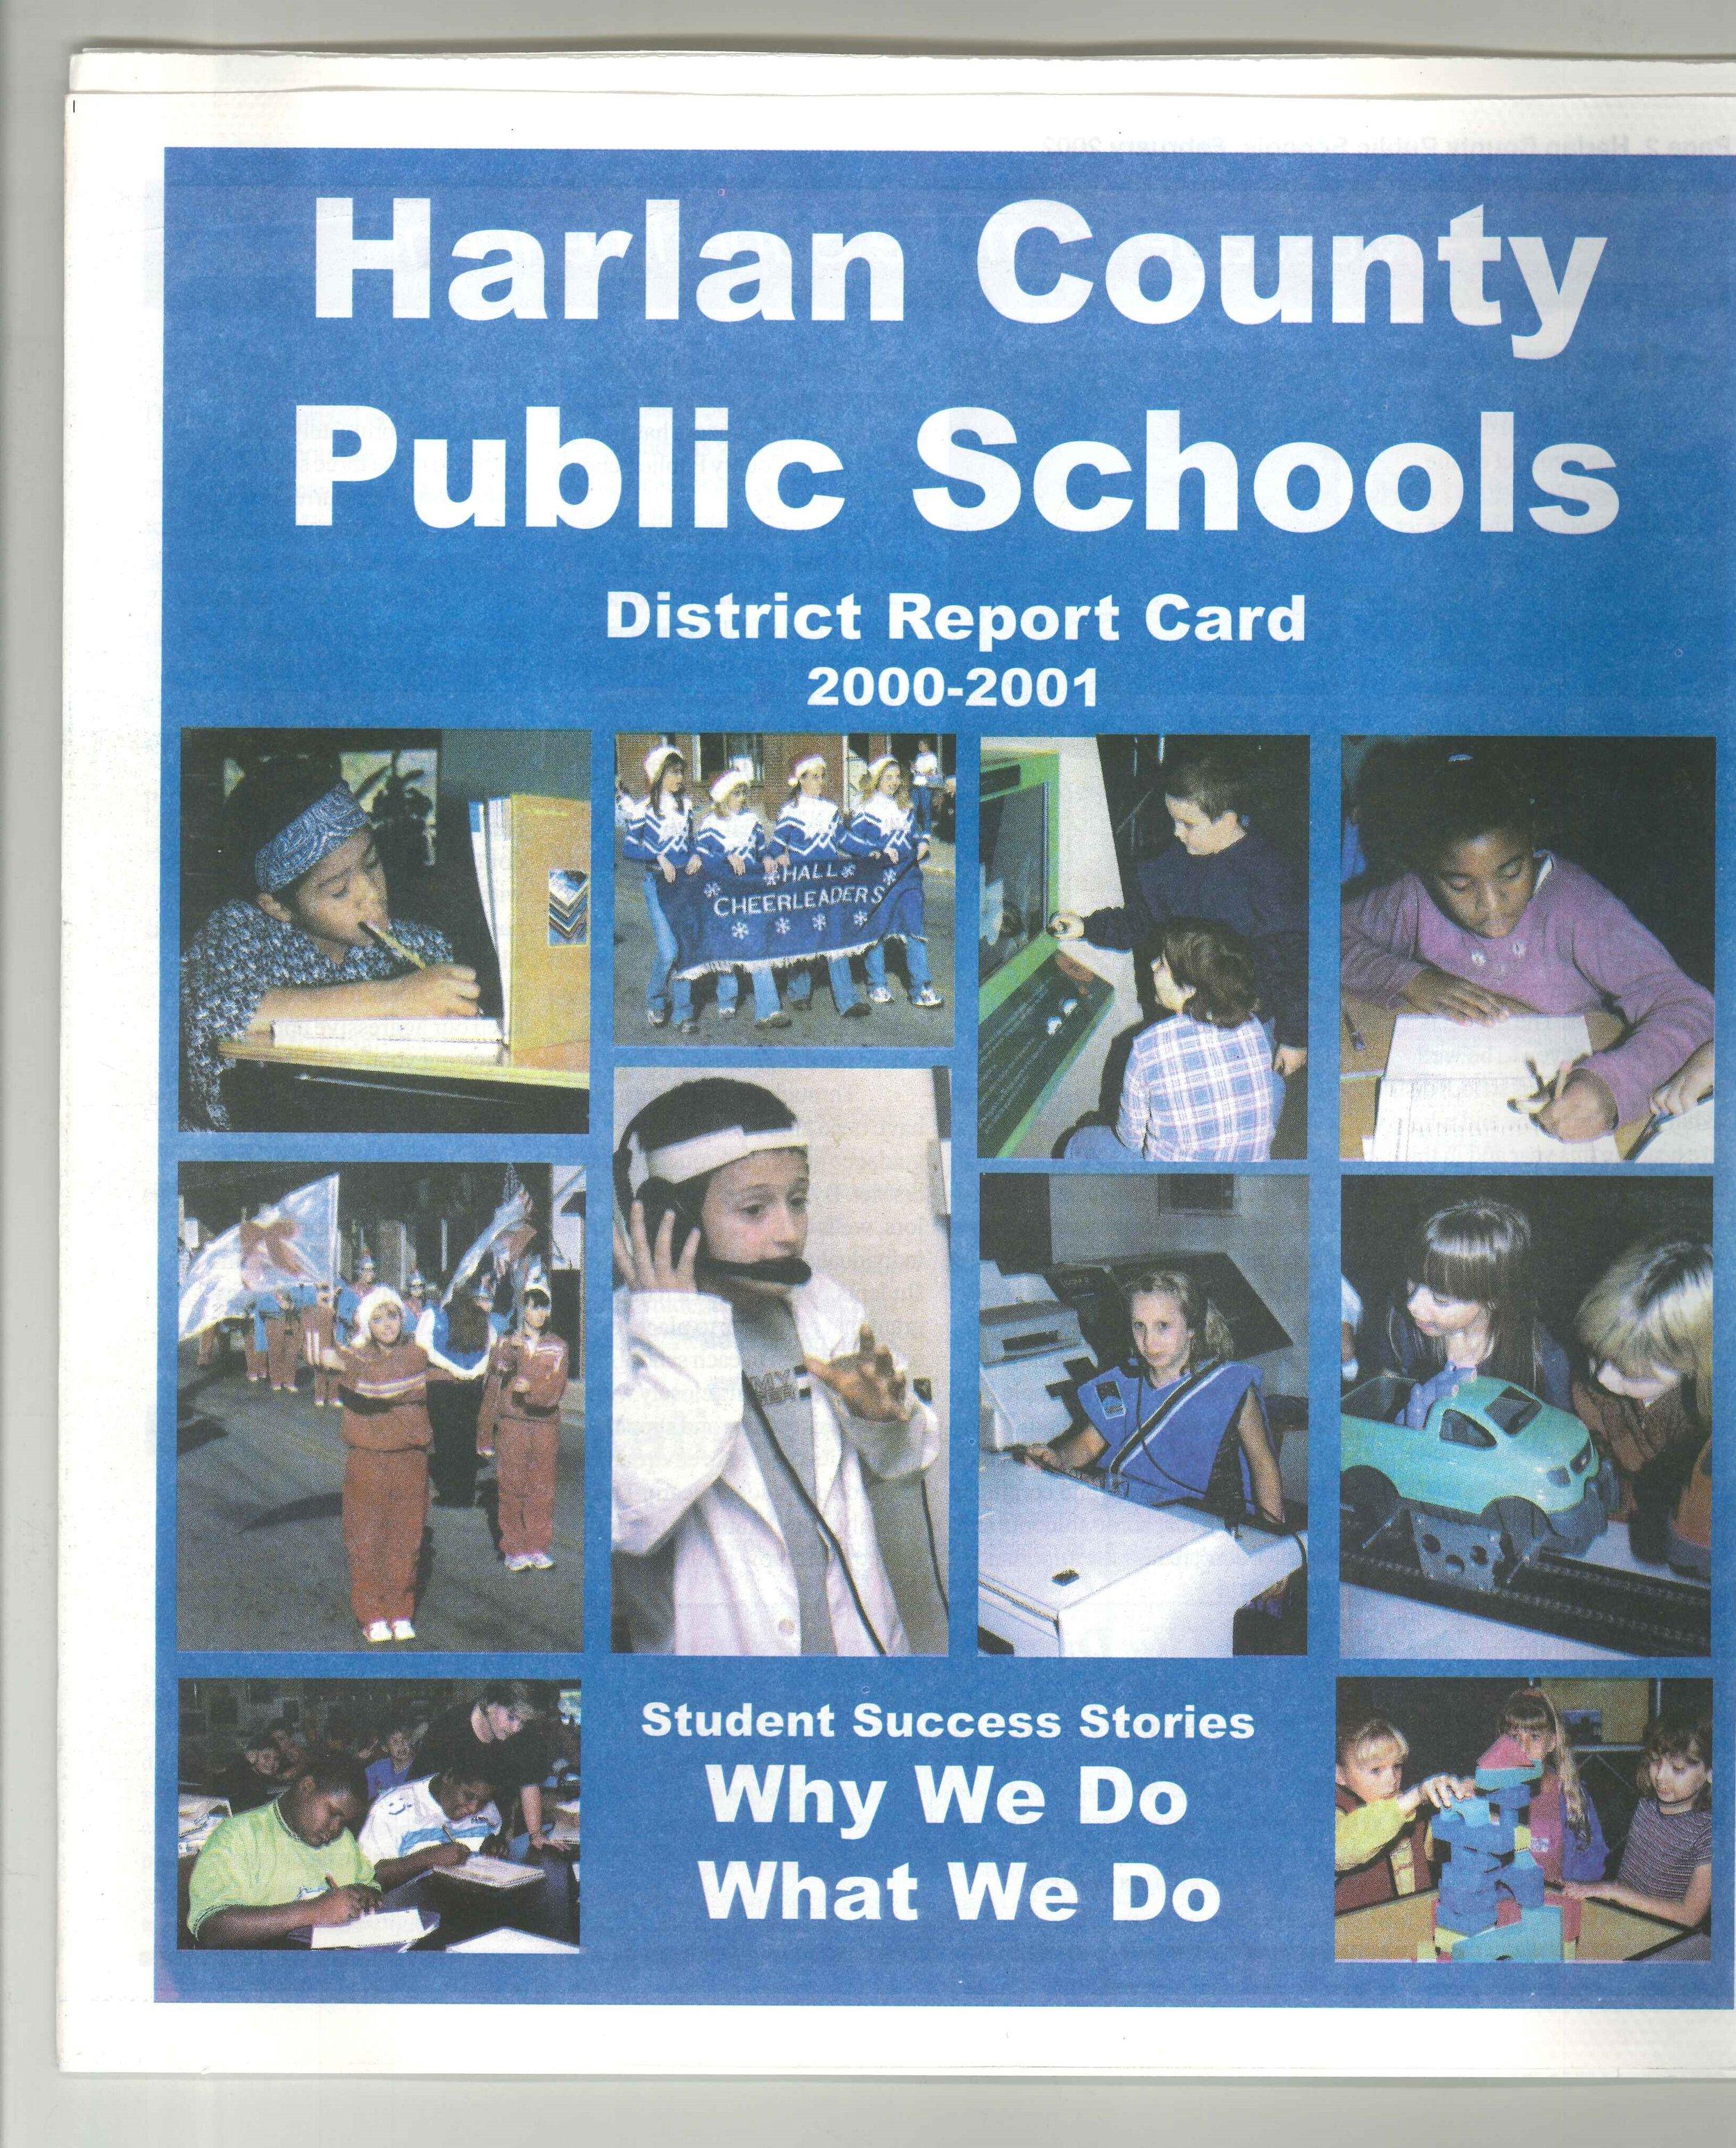 2002-02 Harlan County Public Schools District Report Card 2000-2001.jpg